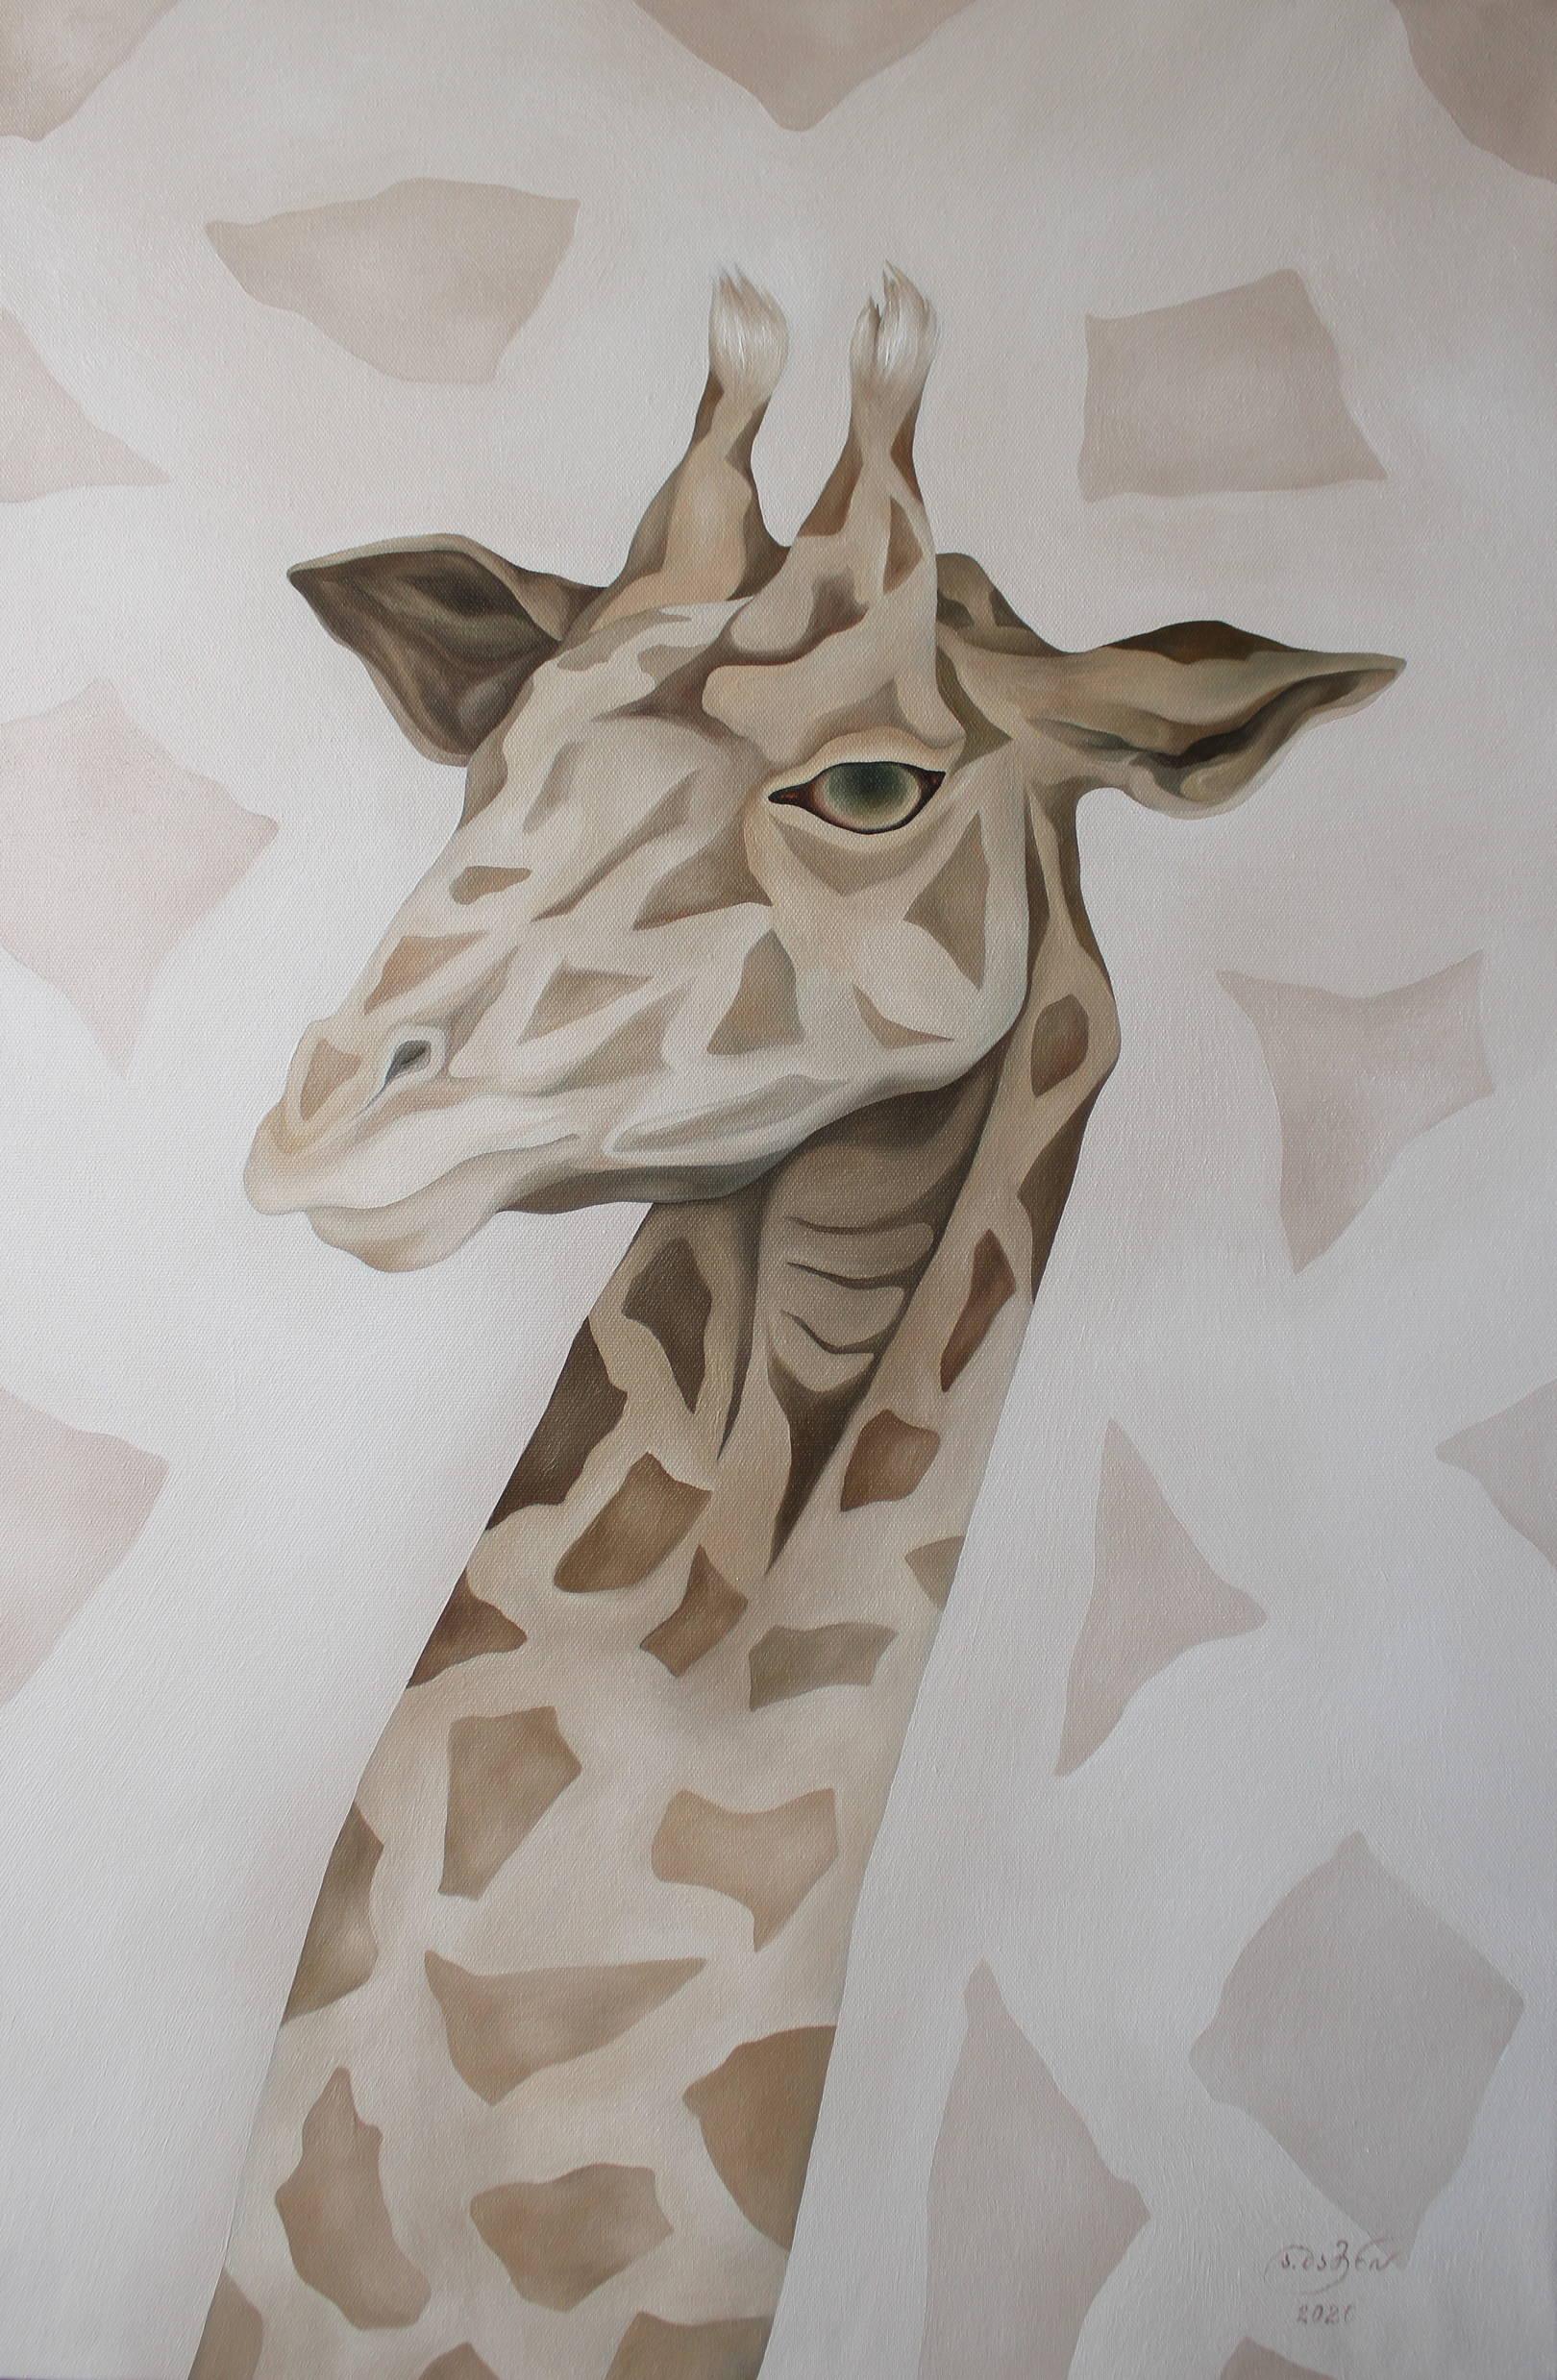 «Жираф — достижение недостижимого» холст, масло «Giraffe - achieving the unattainable» oil on canvas  90x60, 2020